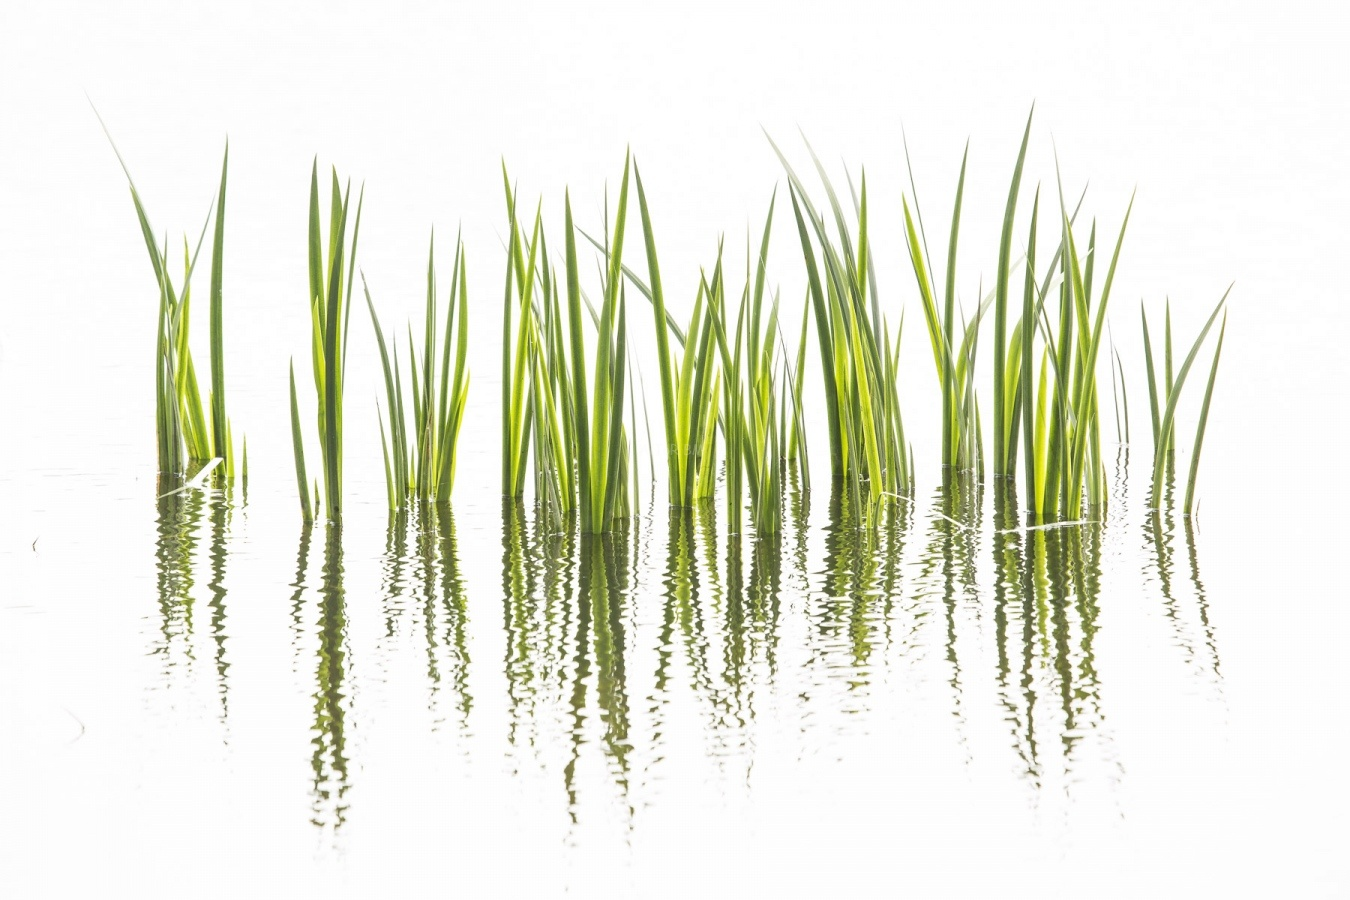 BioPhotoContest 2020 2º place Plants Finalist - my selection   Mi selección - fotografia de aitor badiola